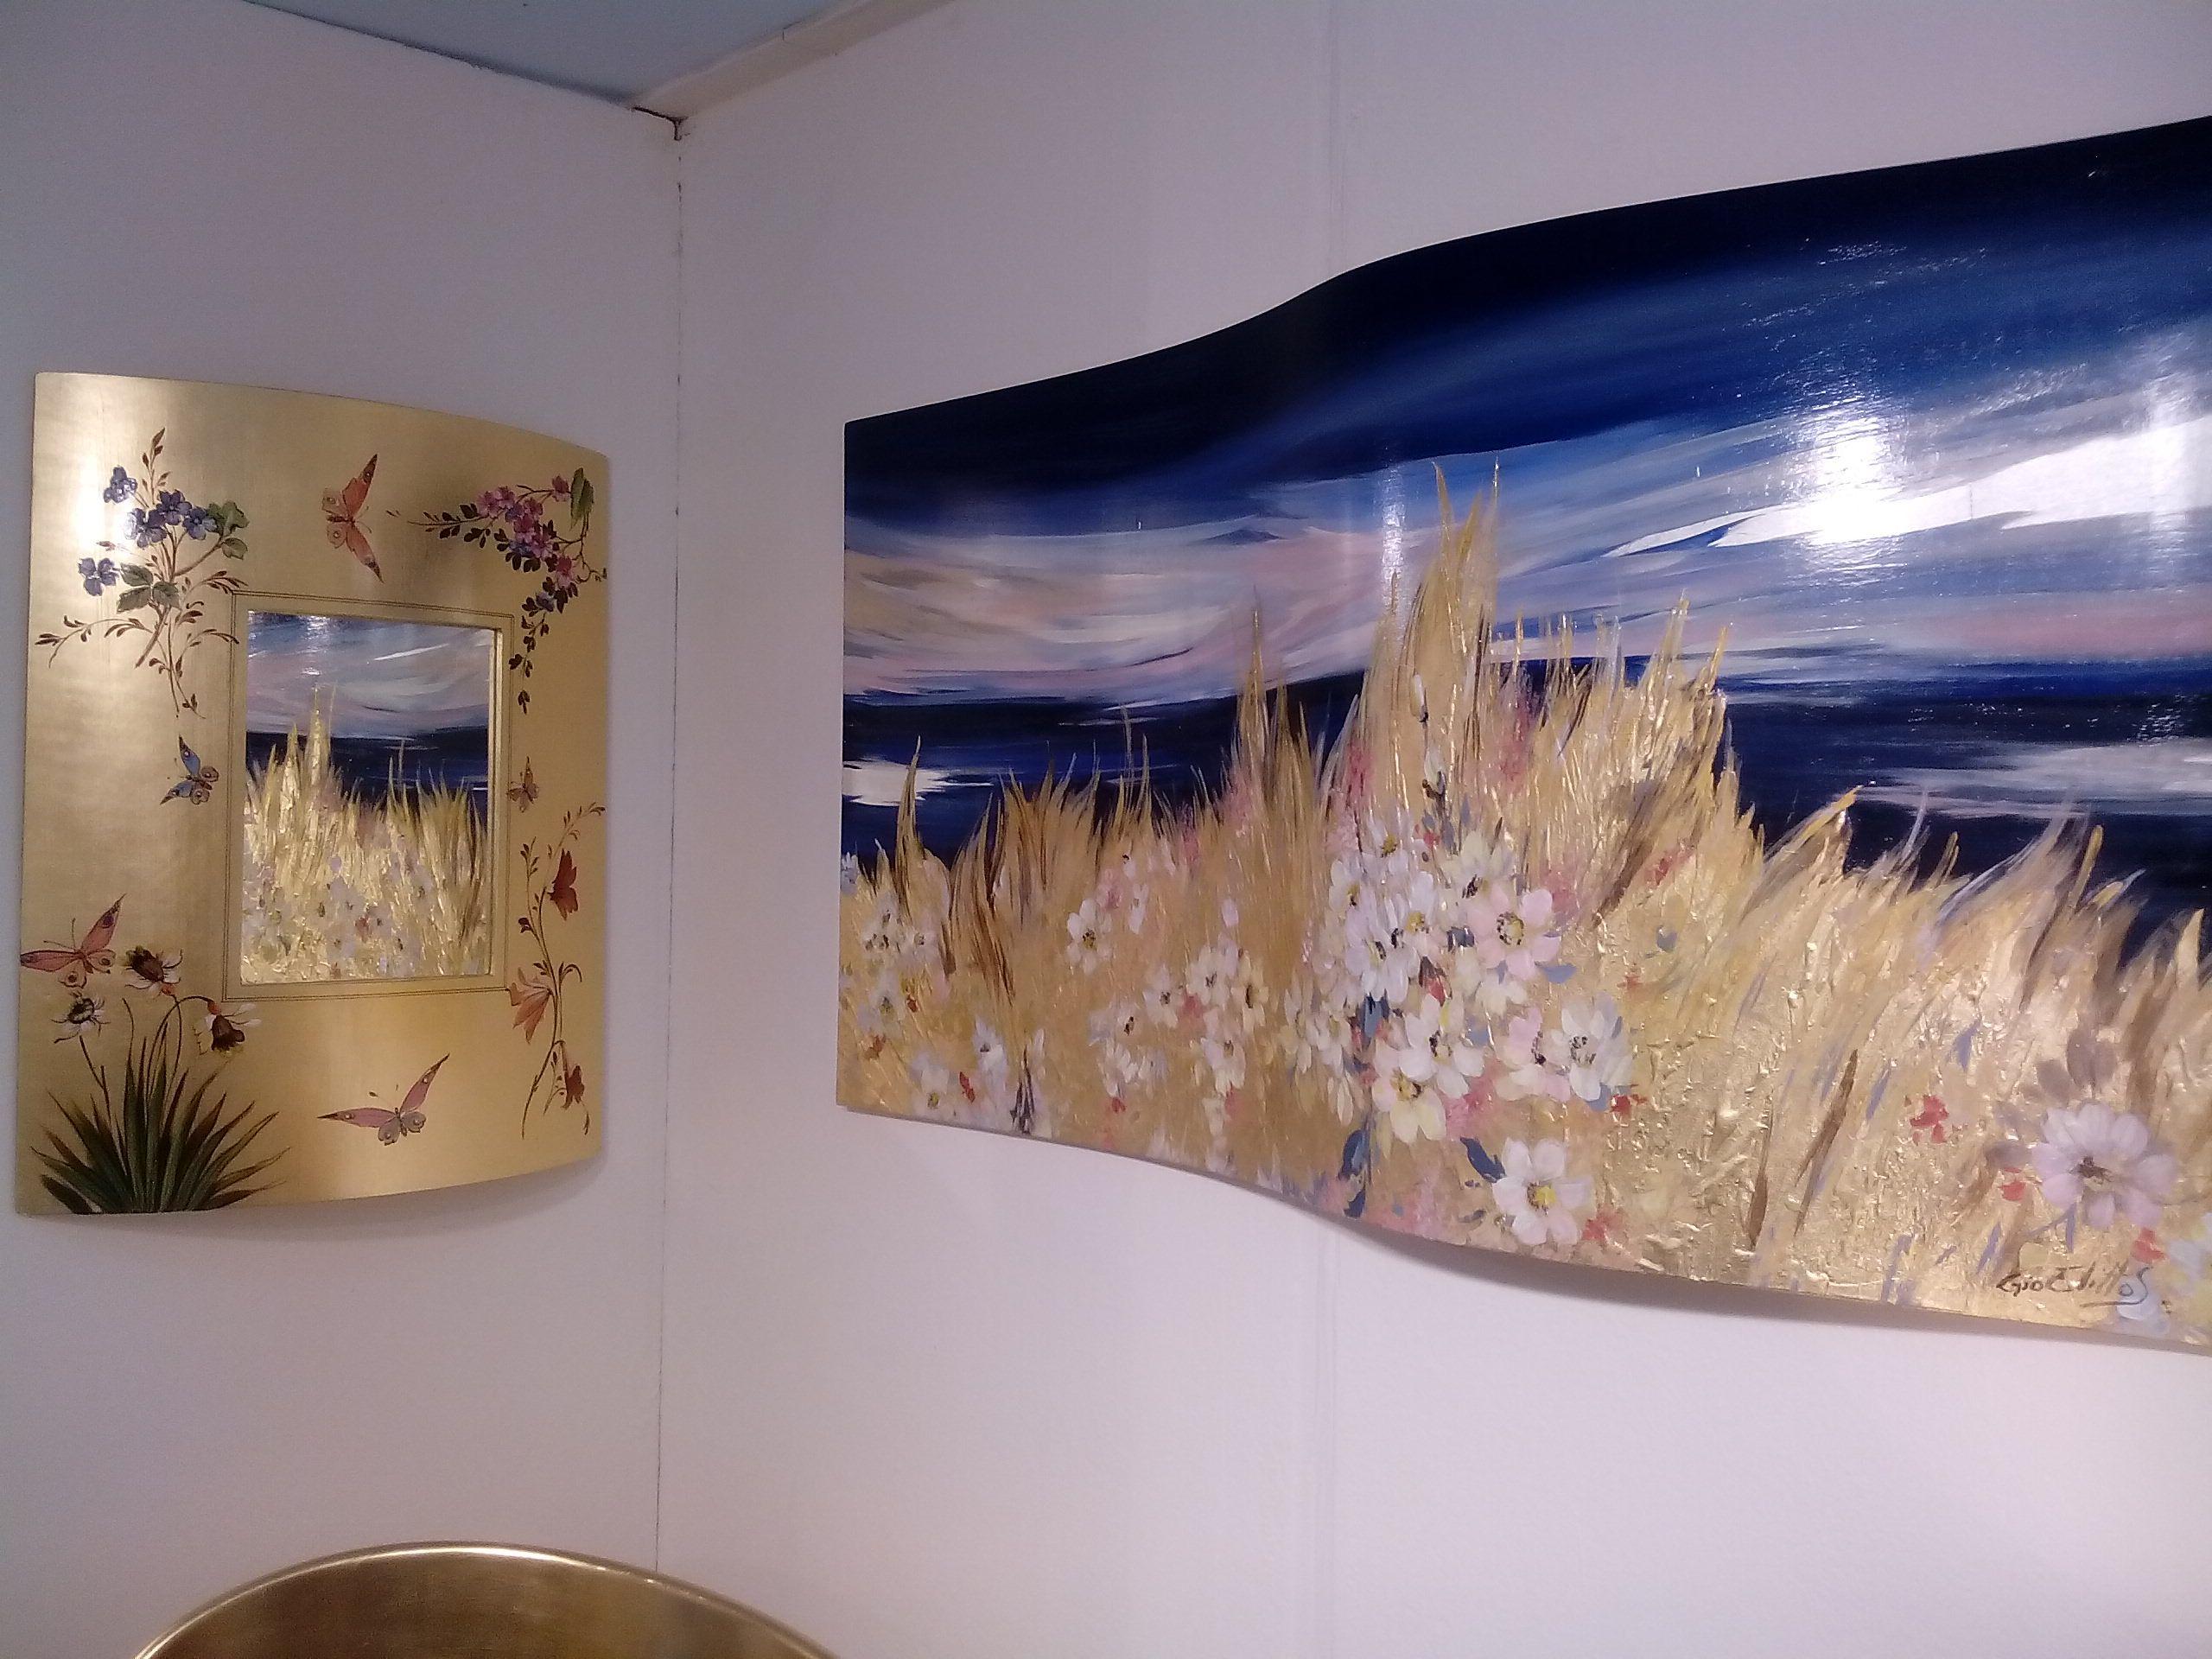 Onda oro riflessa quadro ondulato 145 x 70 cm spighe oro for Specchio ondulato